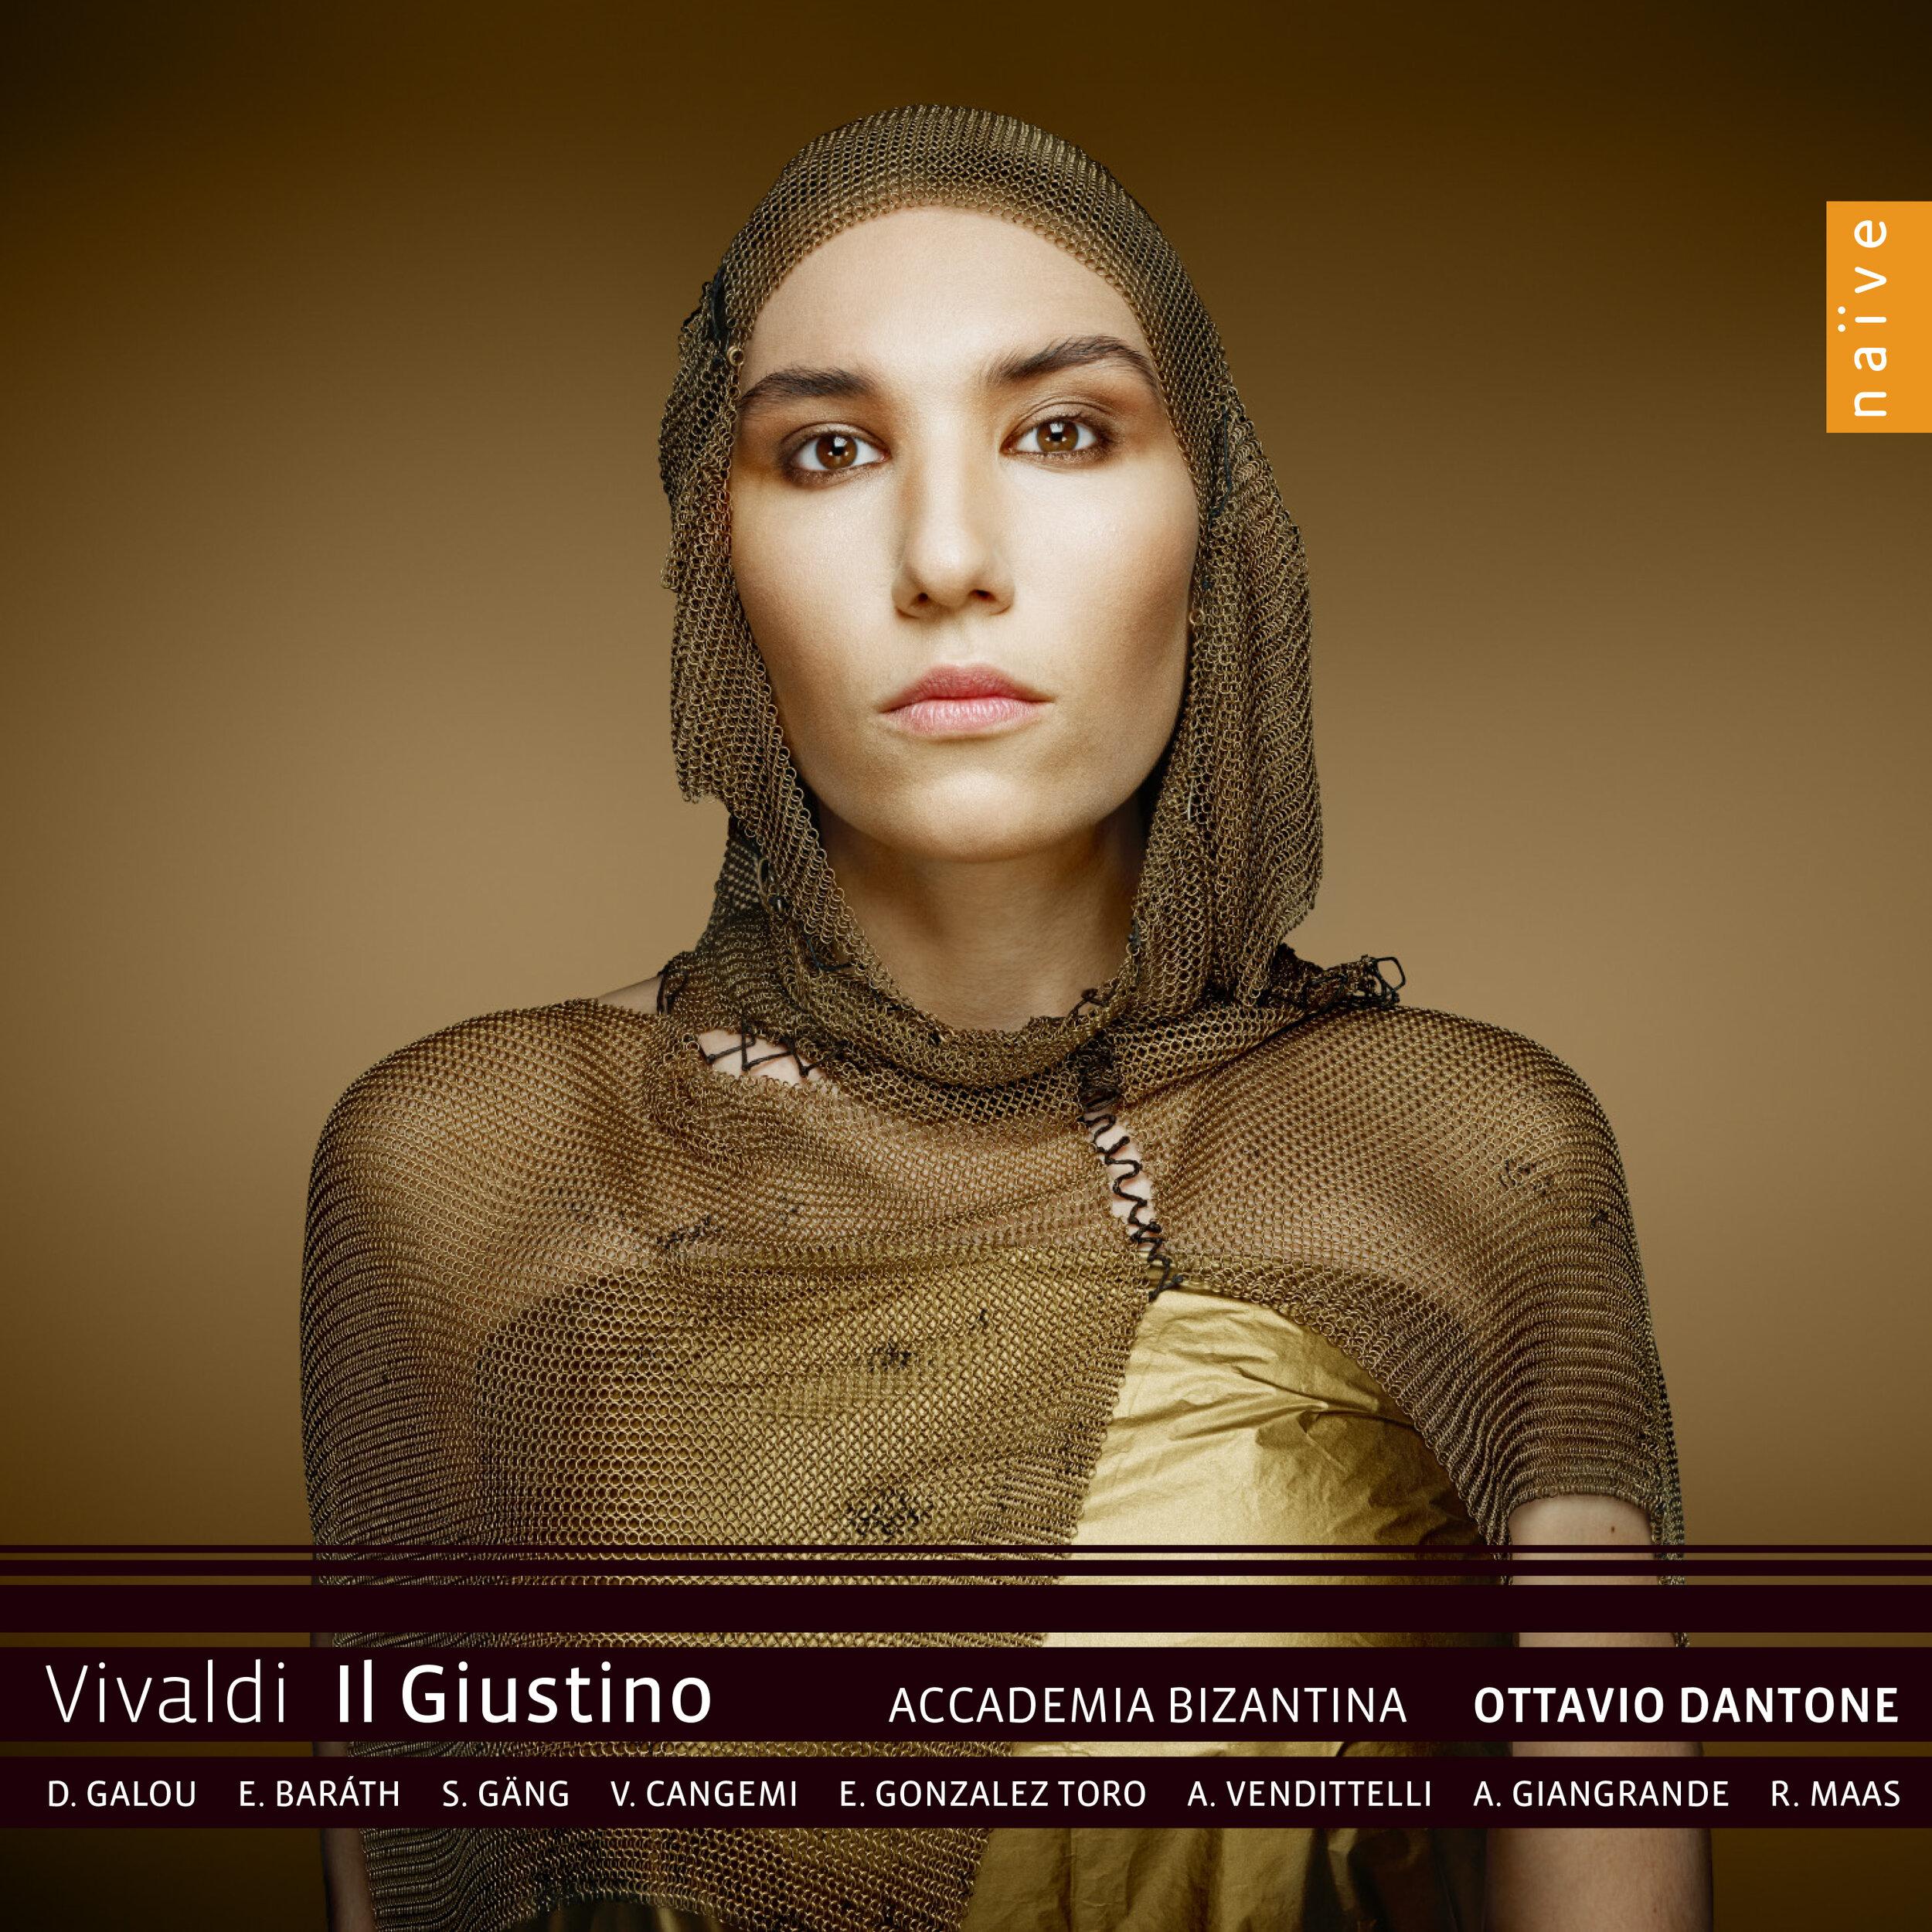 OP30571 K Vivaldi Il Giustino Dantone 3000x3000.jpg